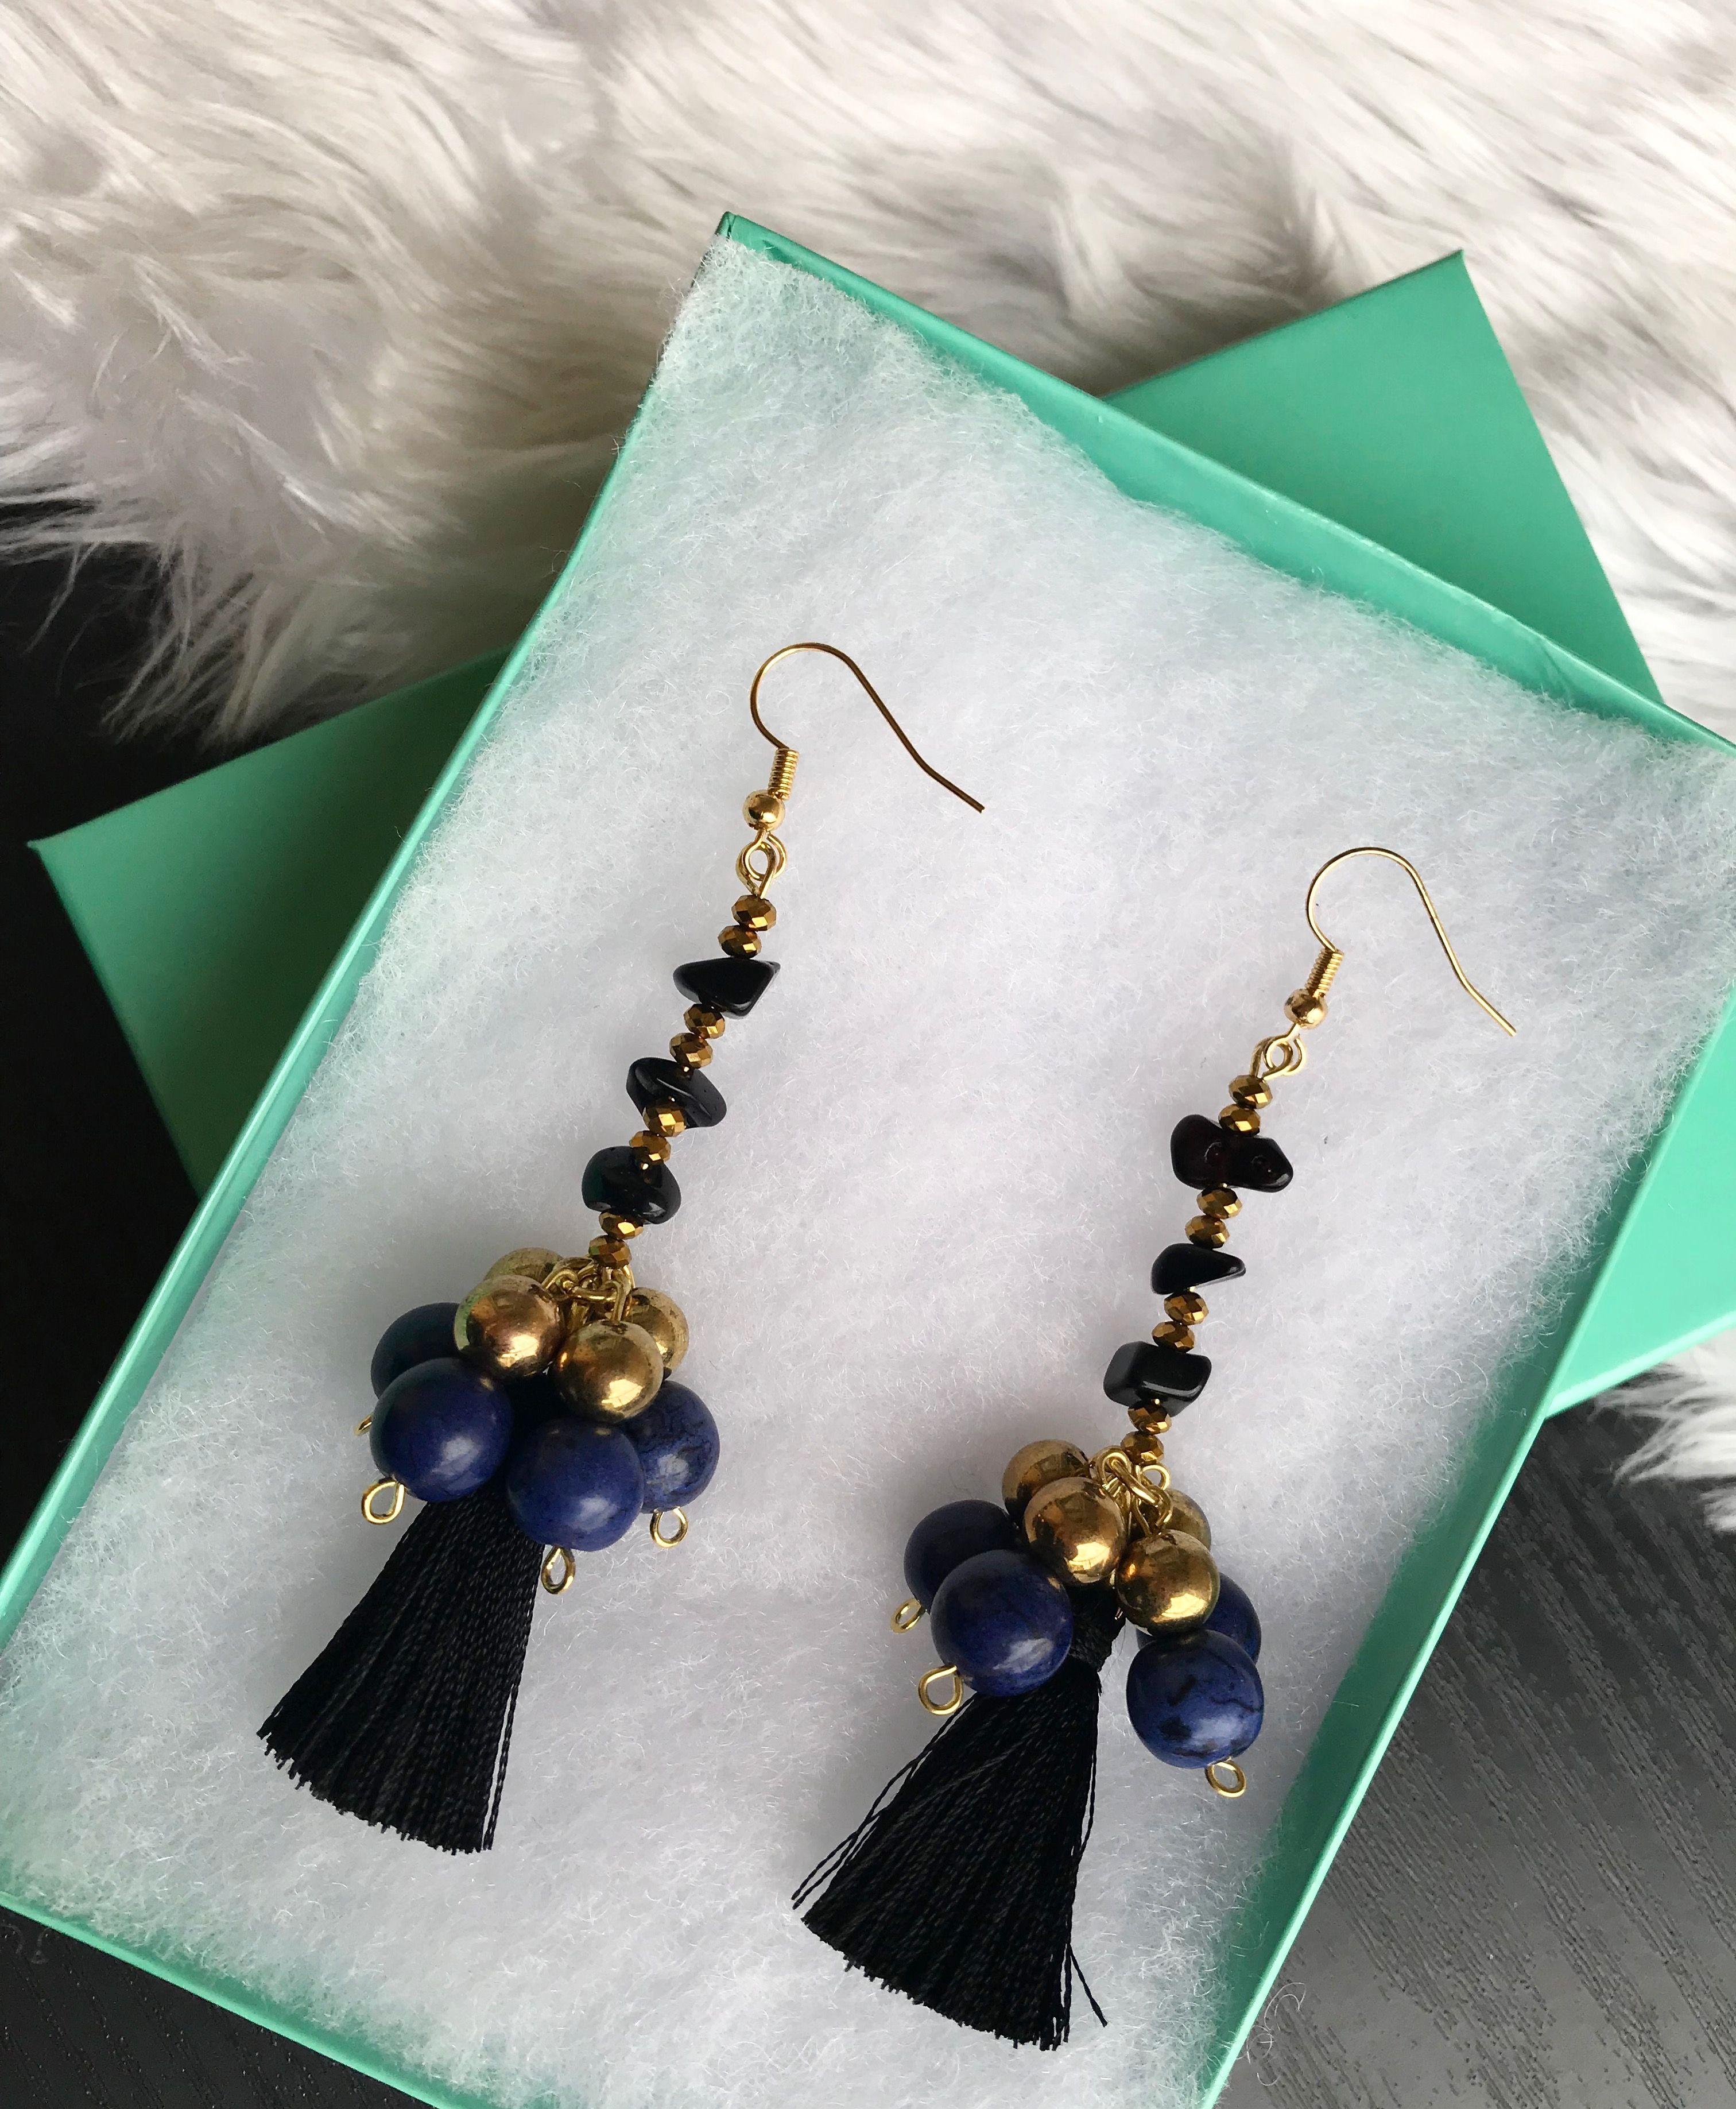 96ccd482b3f0 Pin by Jessica Lloyd on earrings